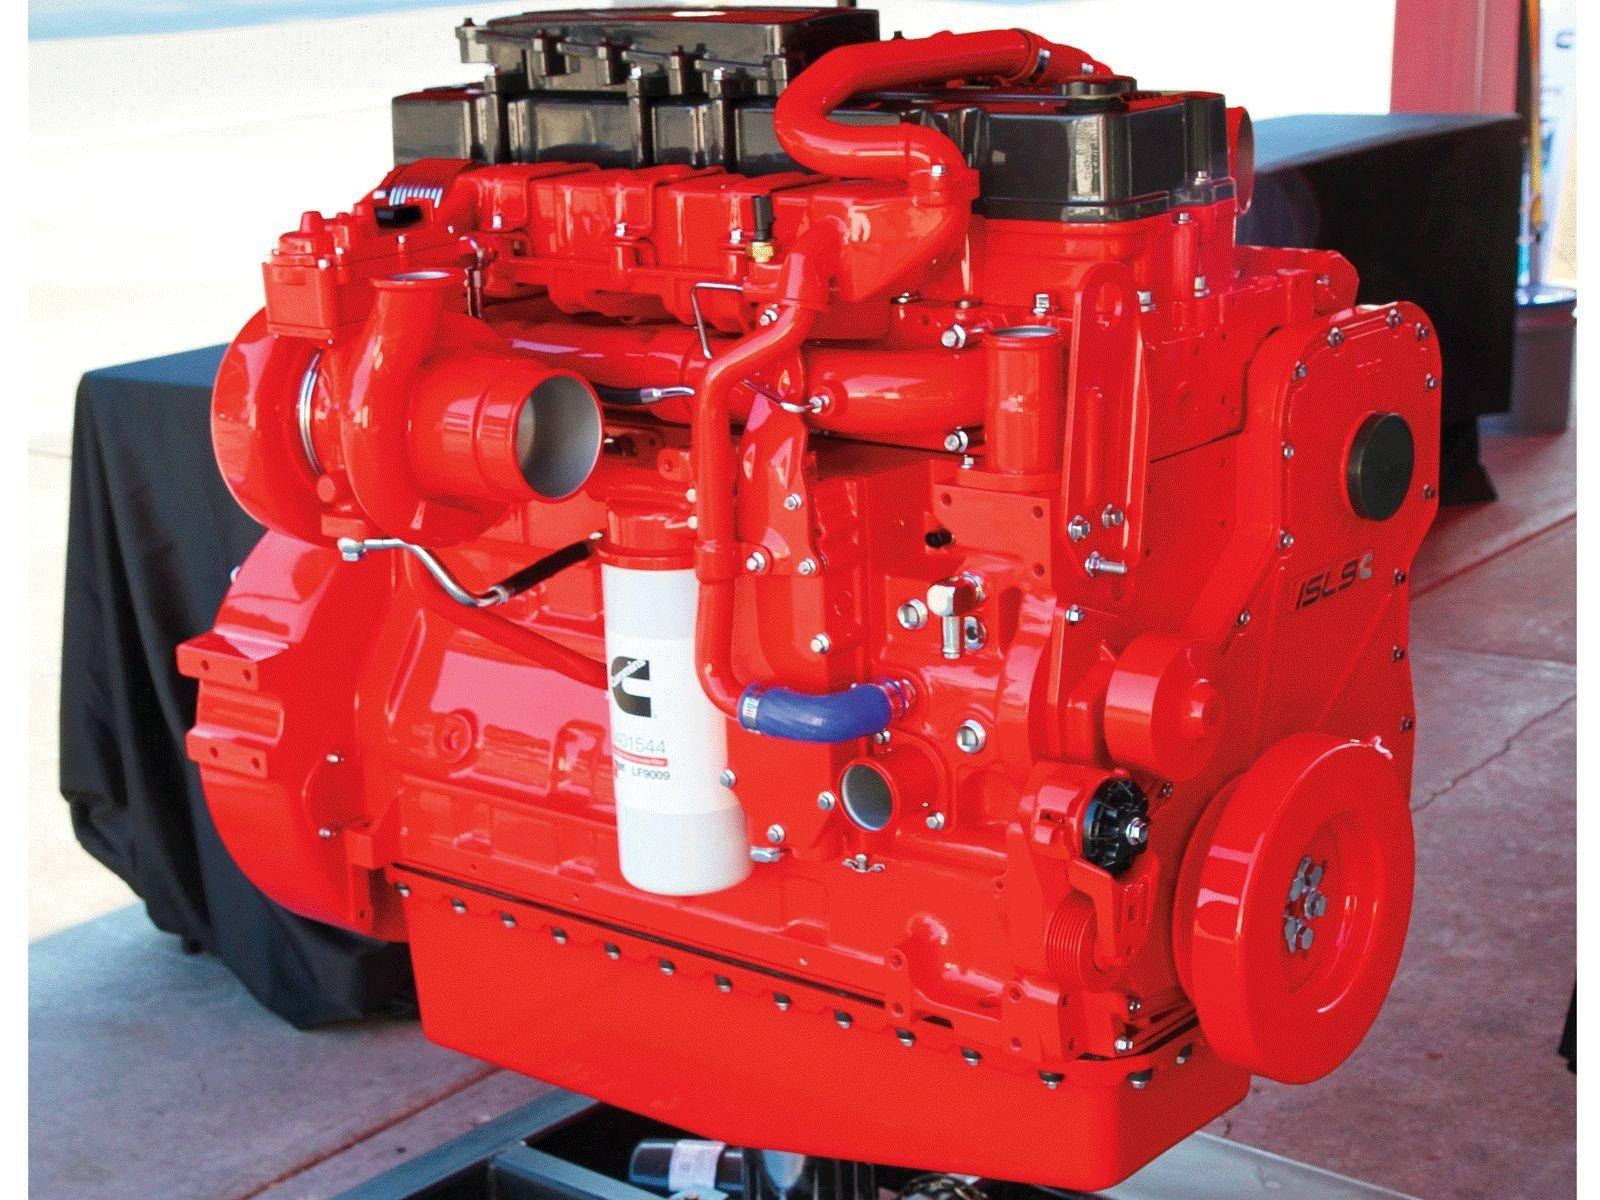 cummins isc series troubleshooting repair and 23 similar items rh bonanza com Cummins ISX EGR Cummins ISX 450 Engines